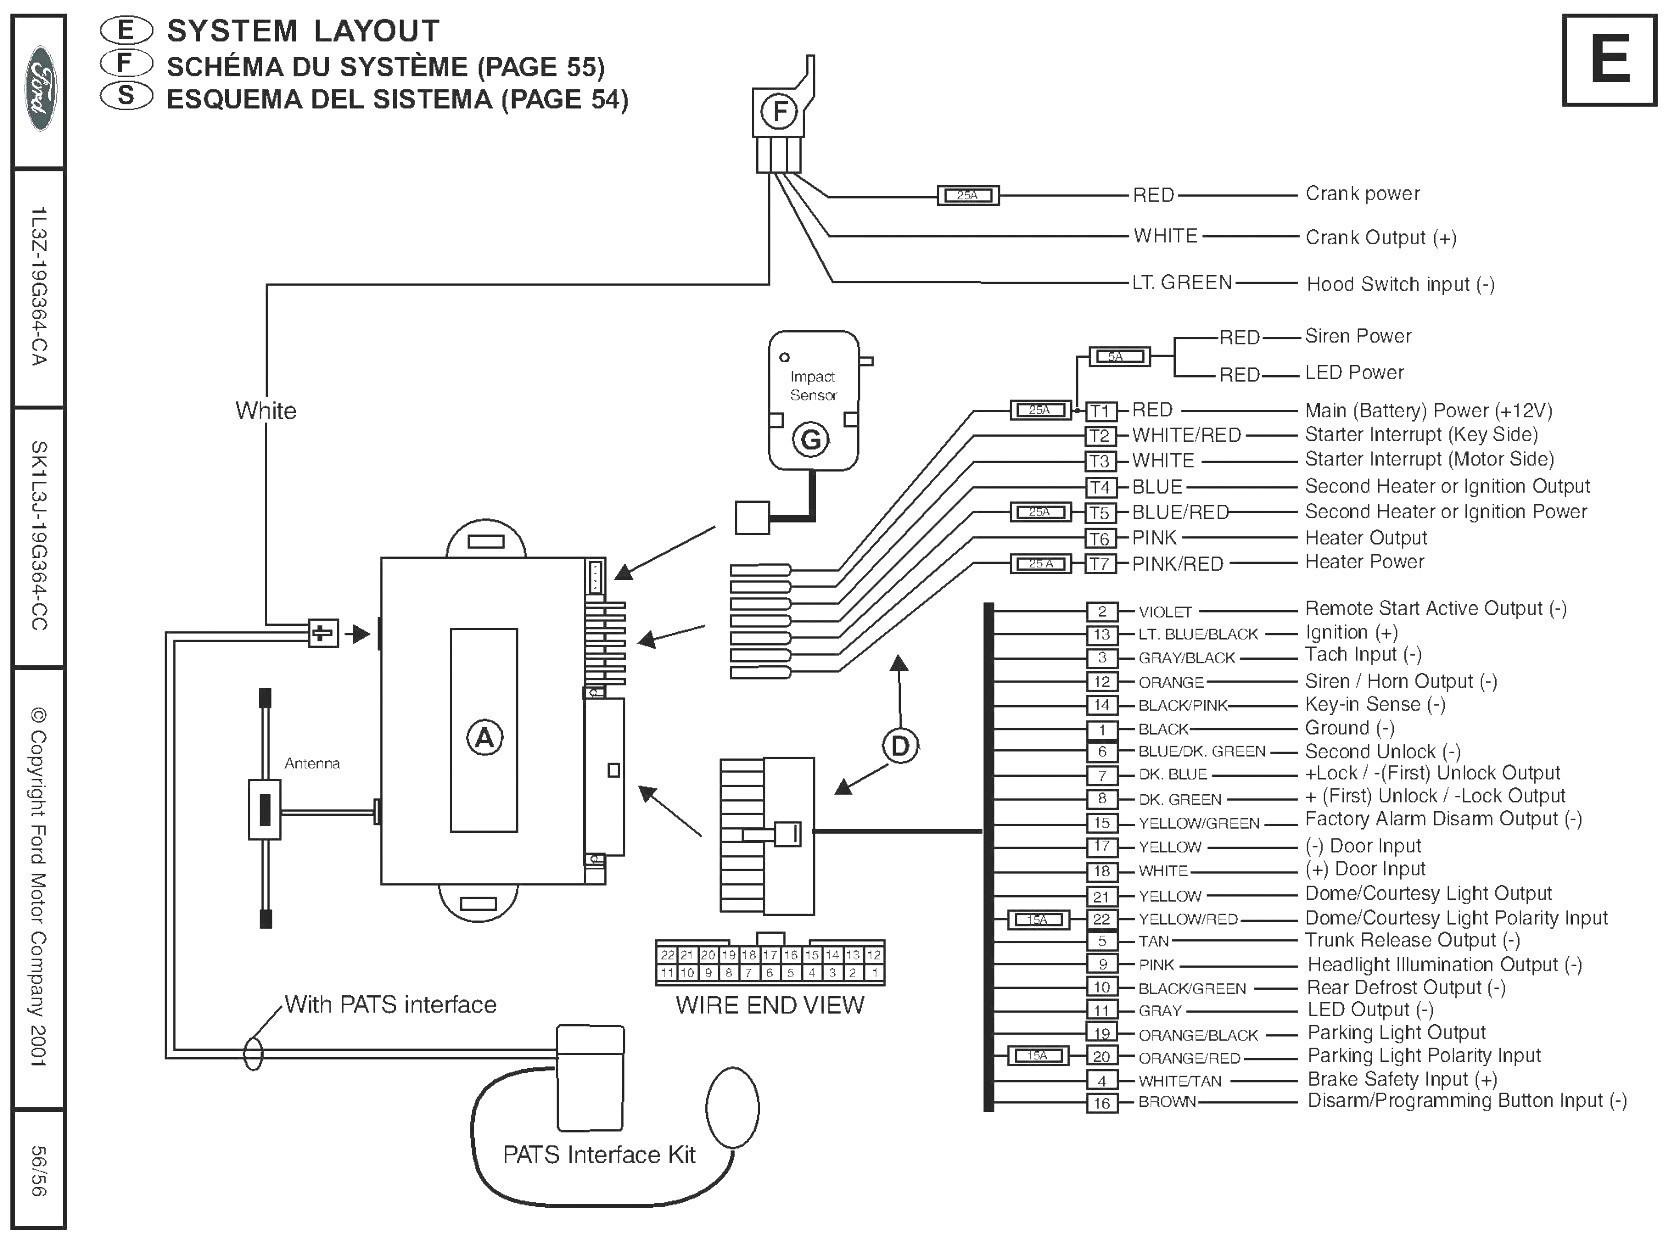 CF58C6 Viper Antenna Wiring Diagram | Wiring Resources on viper tools, viper exhaust, viper blue, viper interior, viper tires, viper antenna, viper chassis, viper electrical, viper seats,